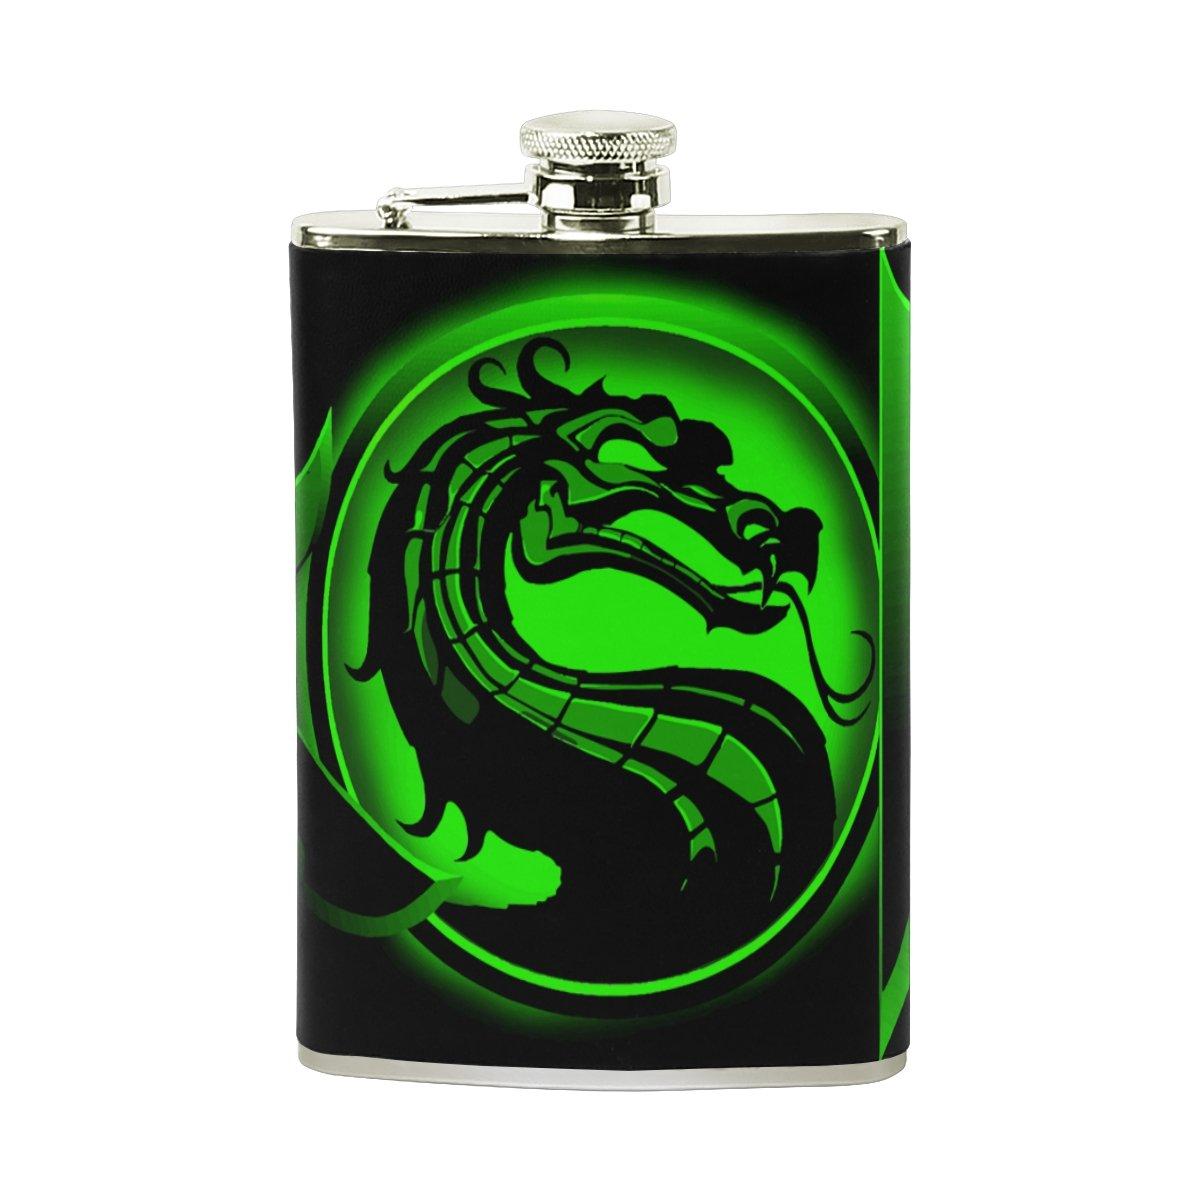 Dragon Leather Stainless Steel Alcohol Whiskey Liquor Wine Pot Flagon Hip Flask Portable Pocket Bottle - 8 oz